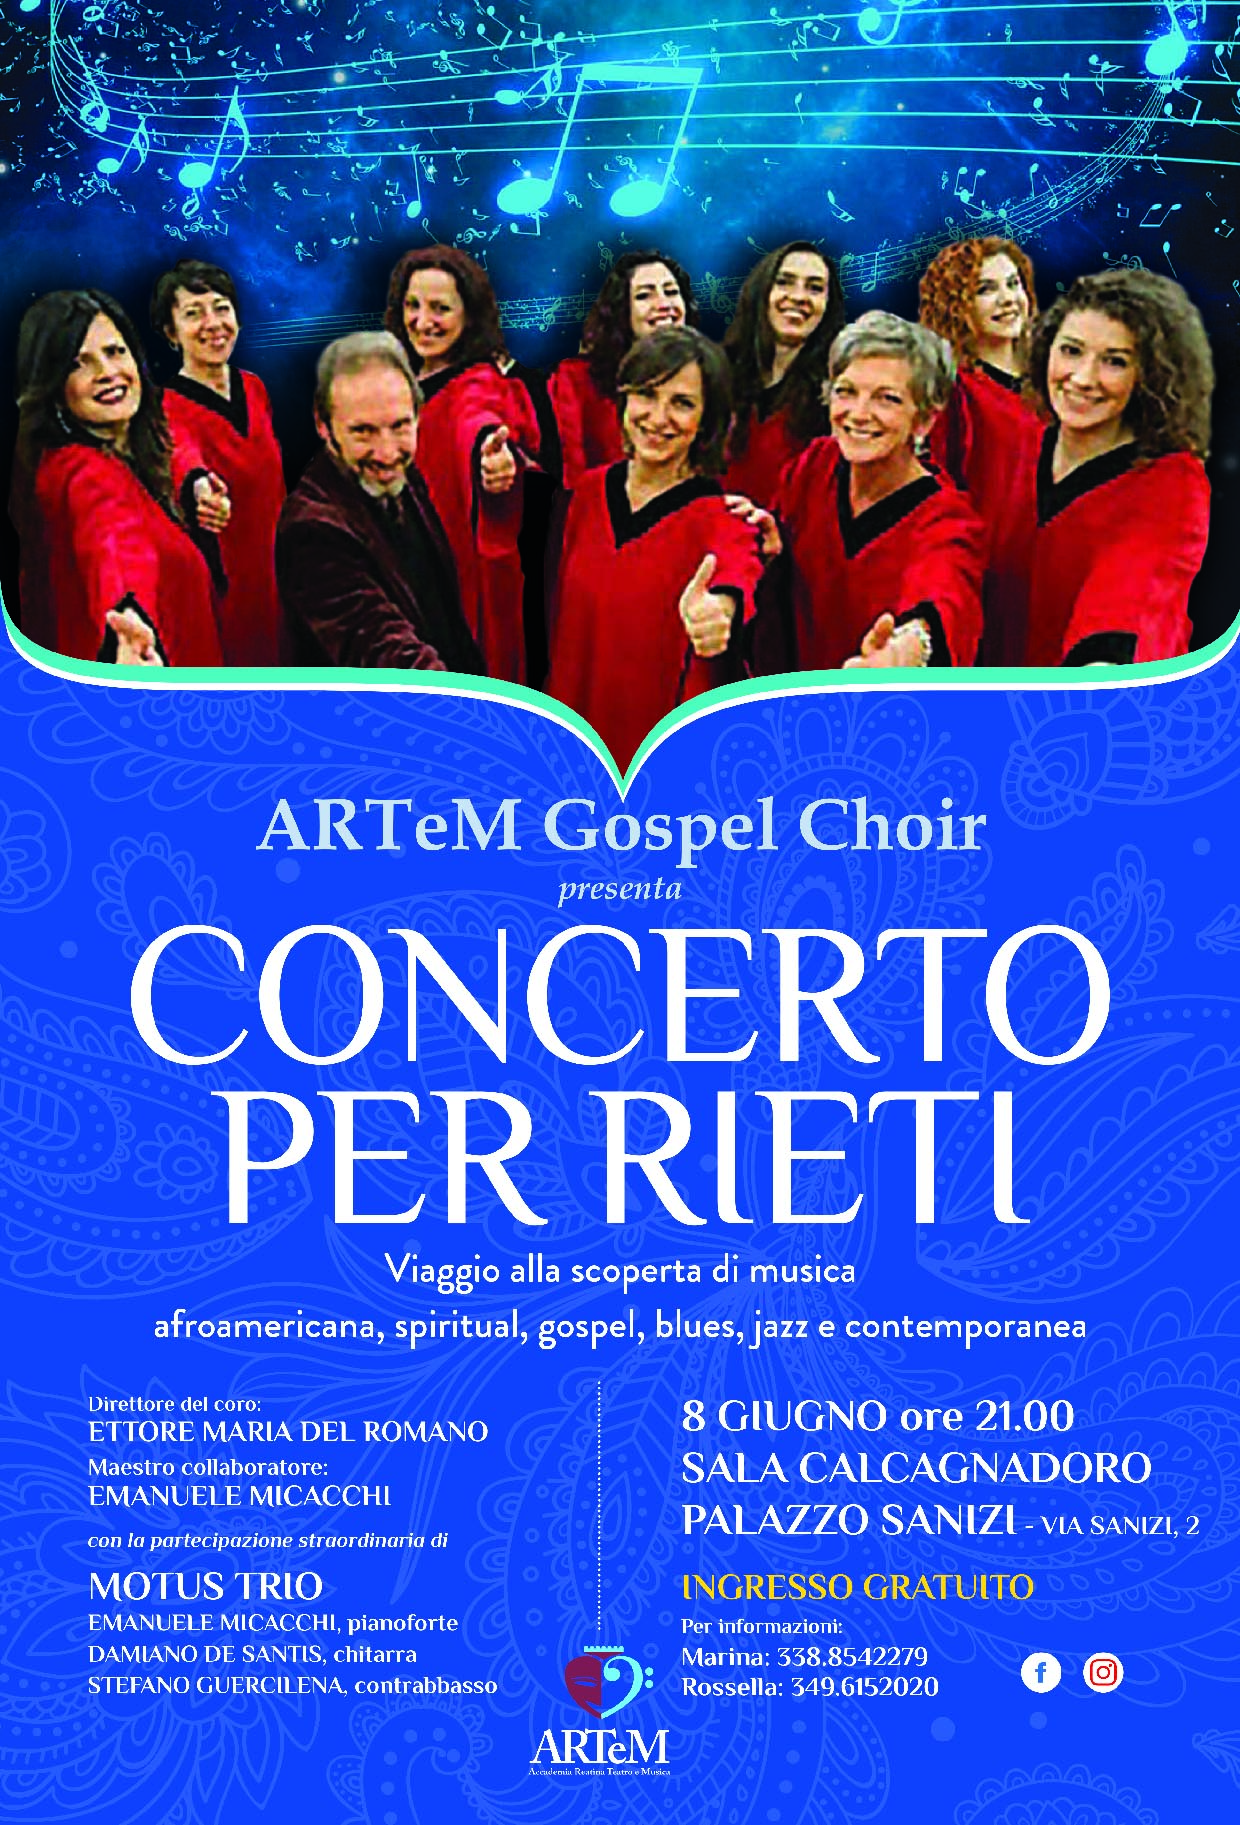 A Rieti l'8 giugno il concerto Artem Gospel Choir